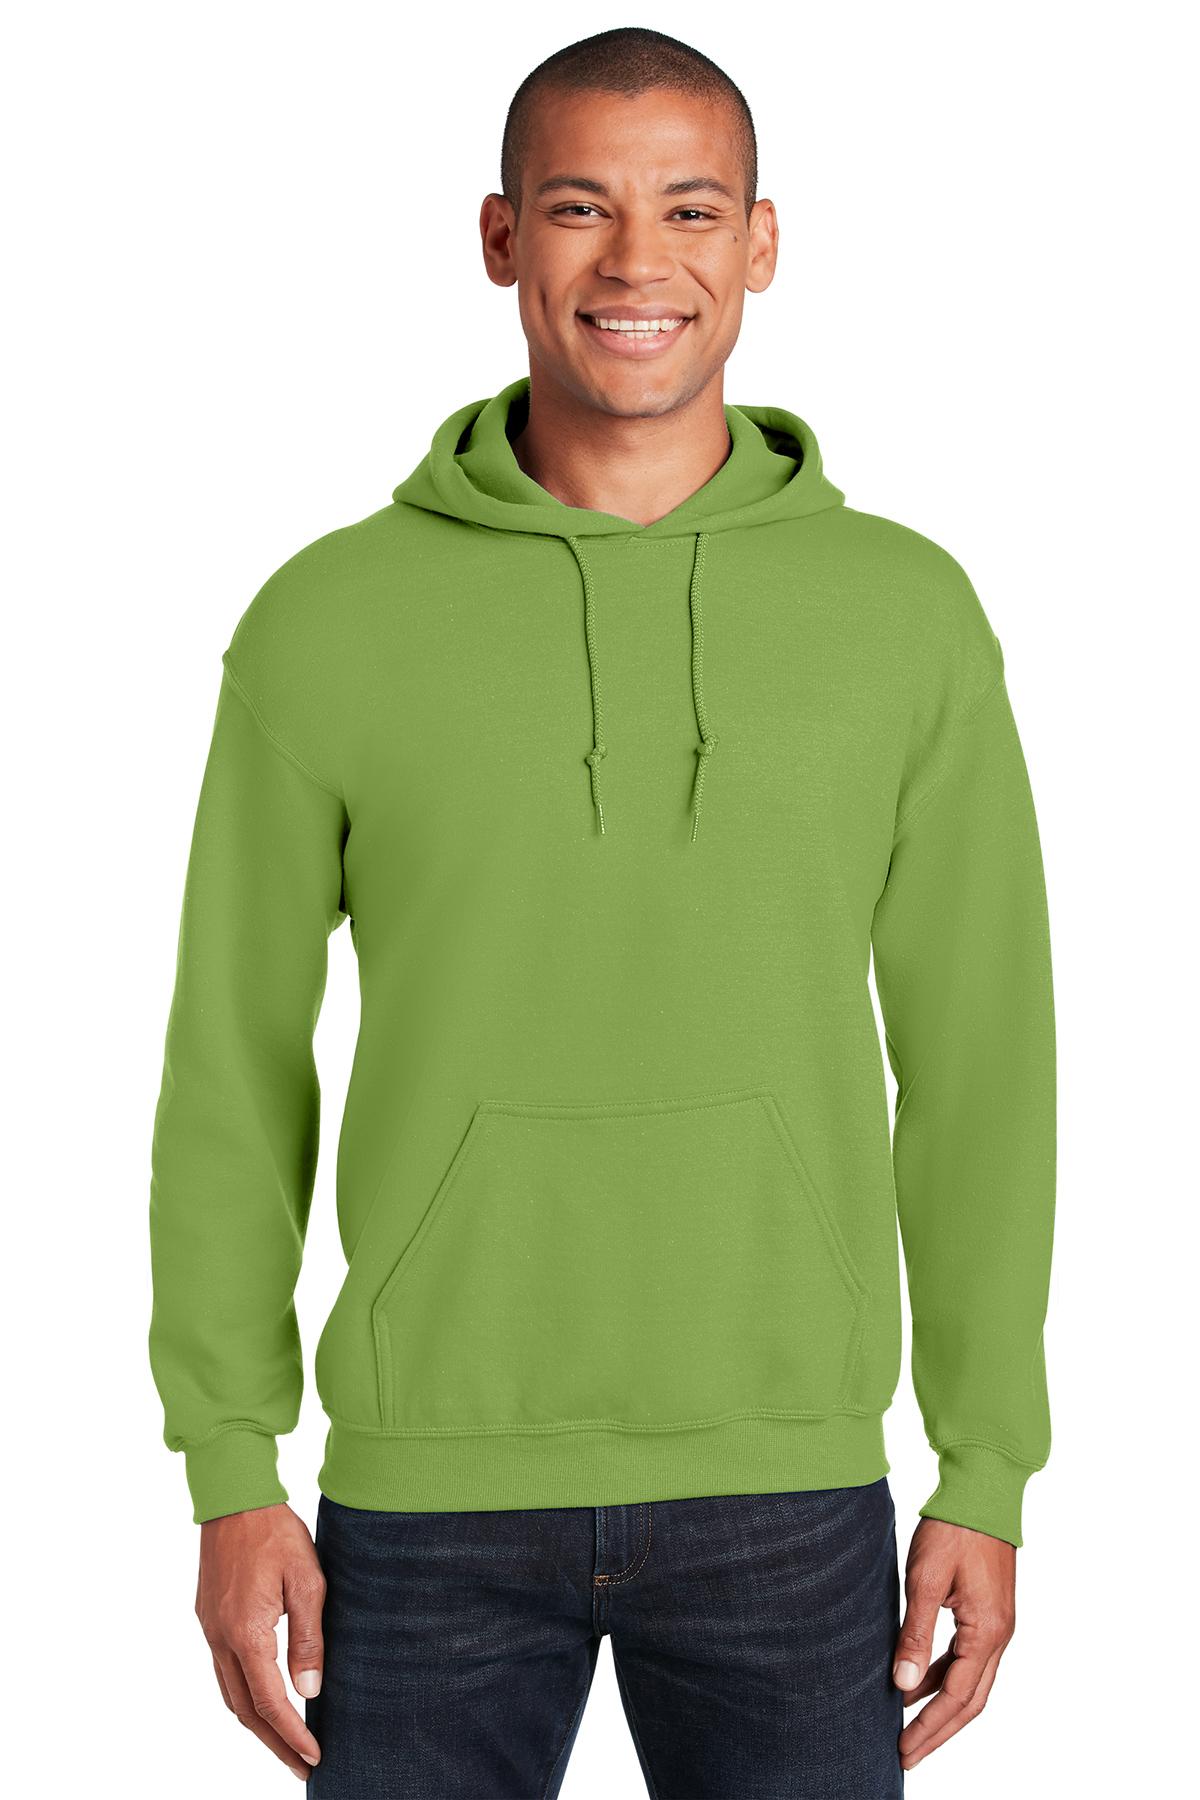 1 Sand Gildan G18500 Heavy Blend Adult Unisex Hooded Sweatshirt S 1 Ash